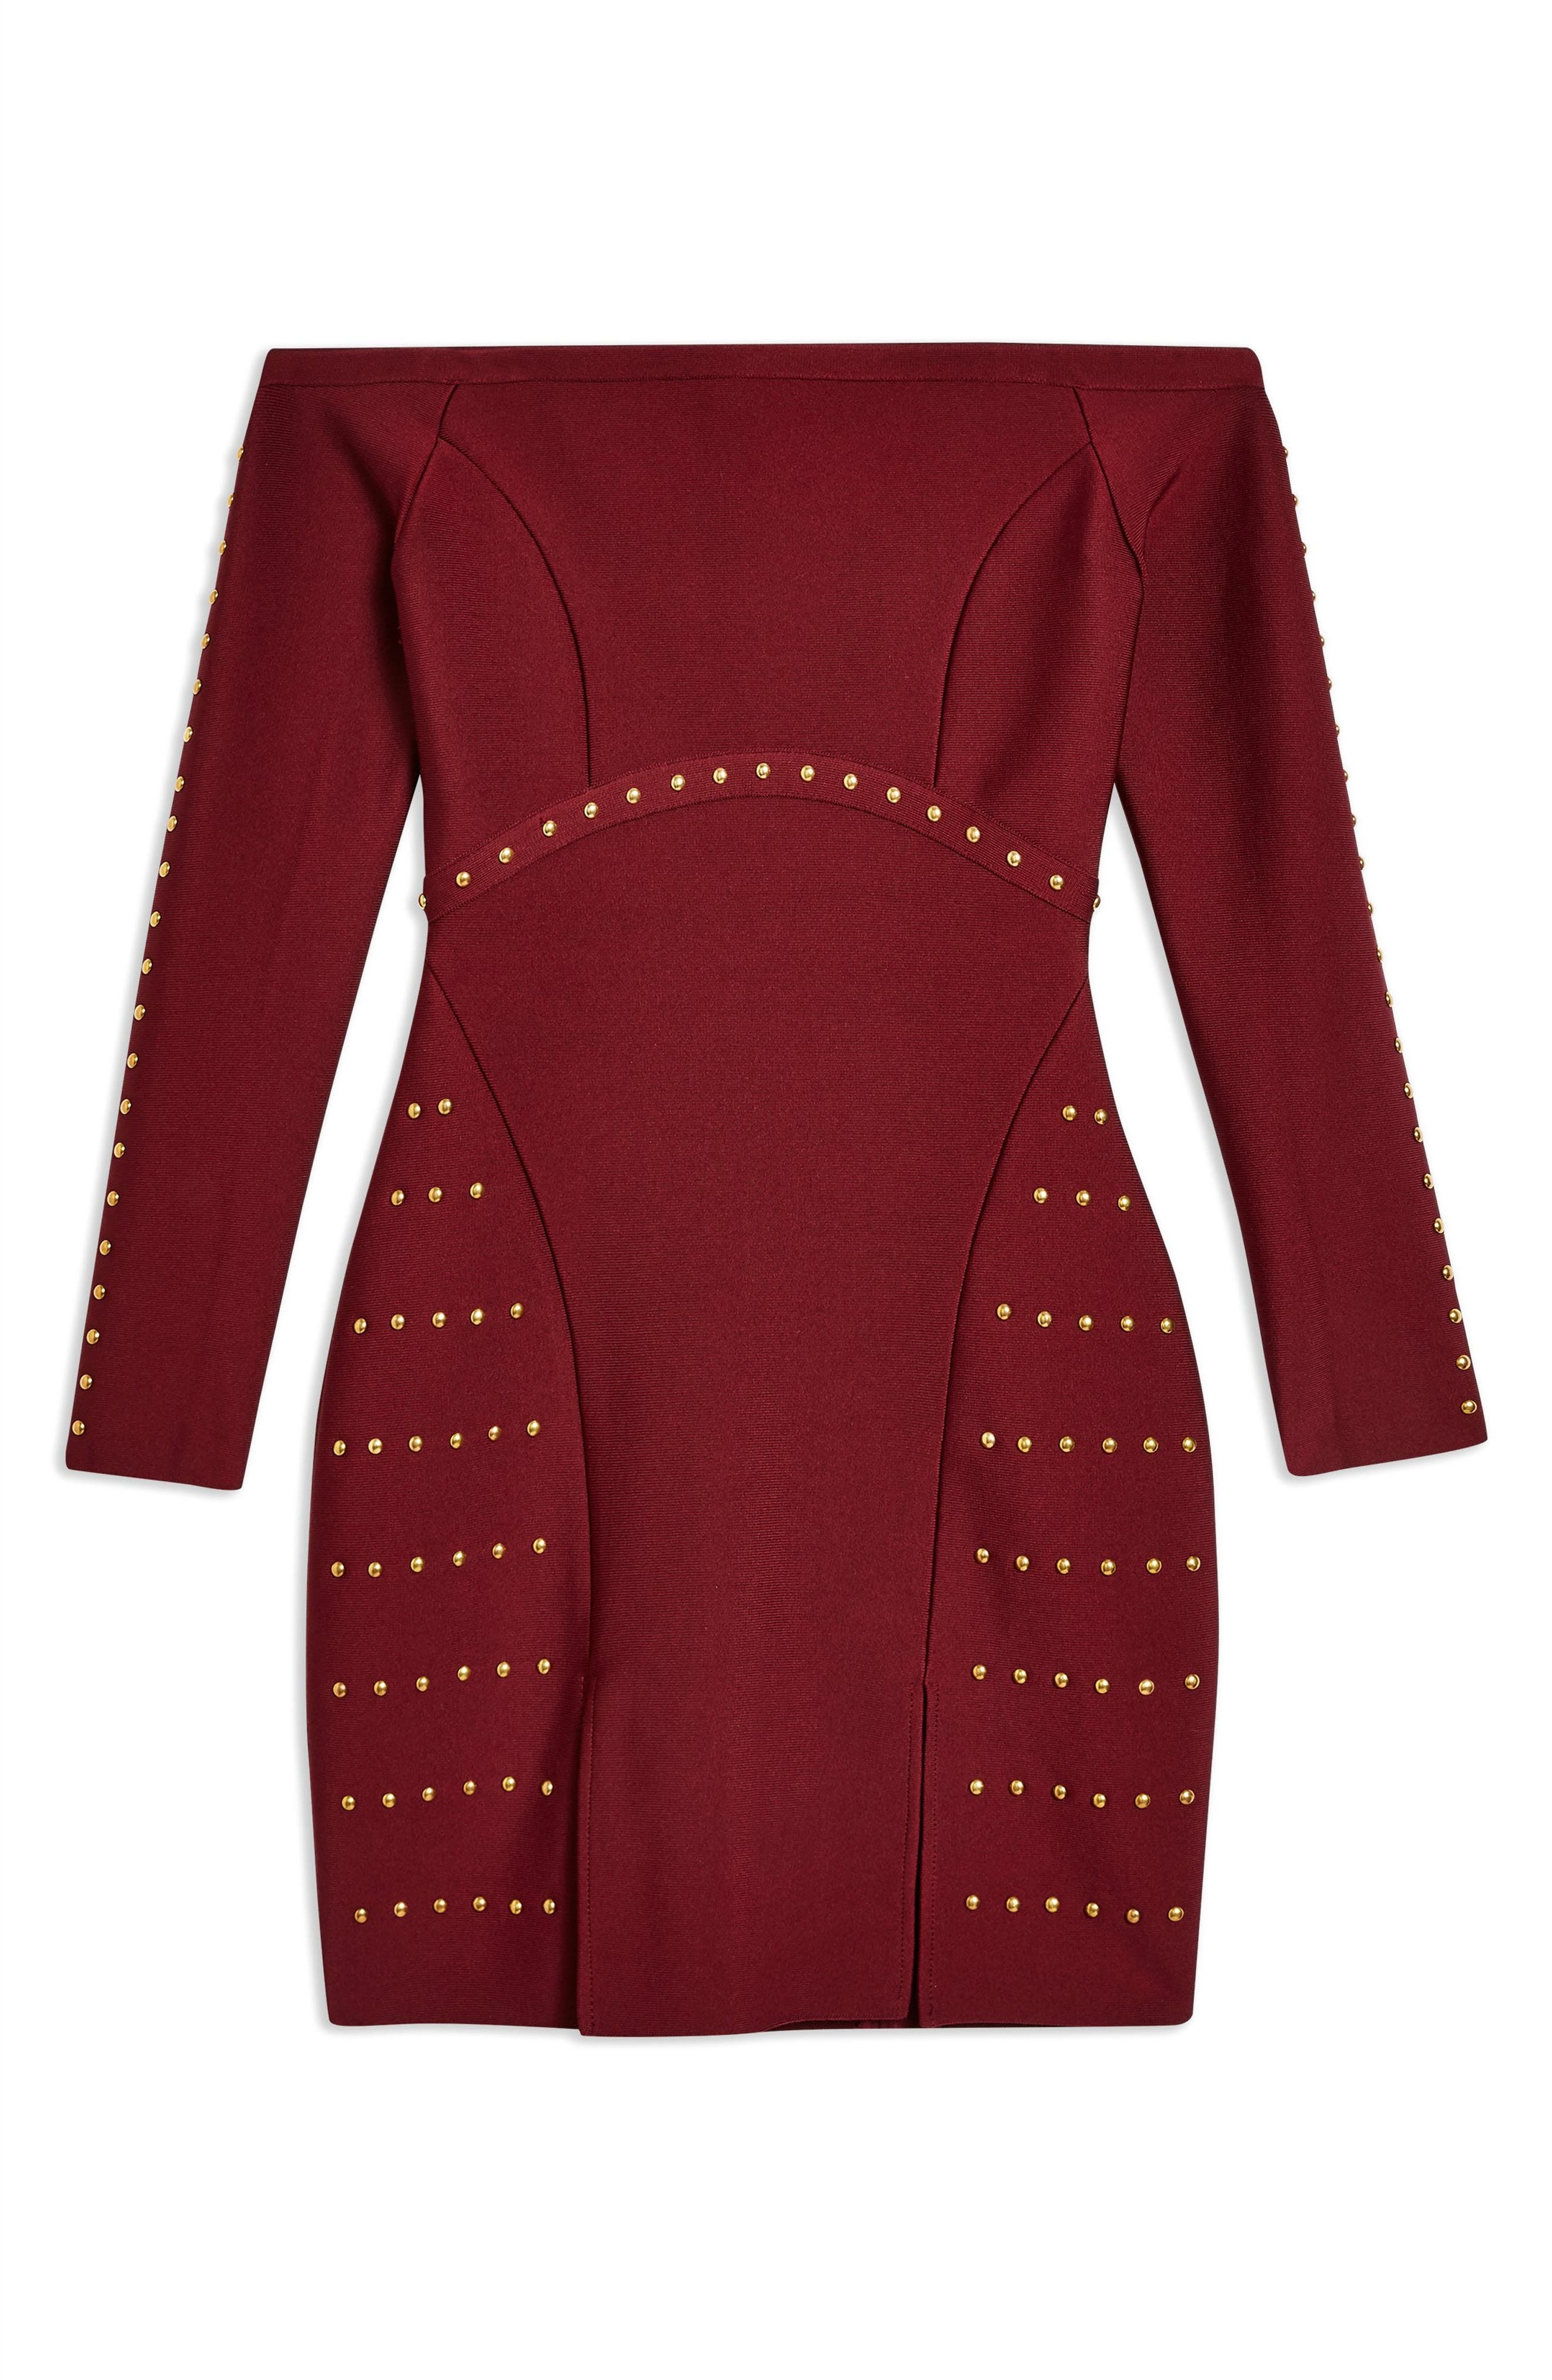 Studded Off the Shoulder Dress,                             Alternate thumbnail 3, color,                             RED